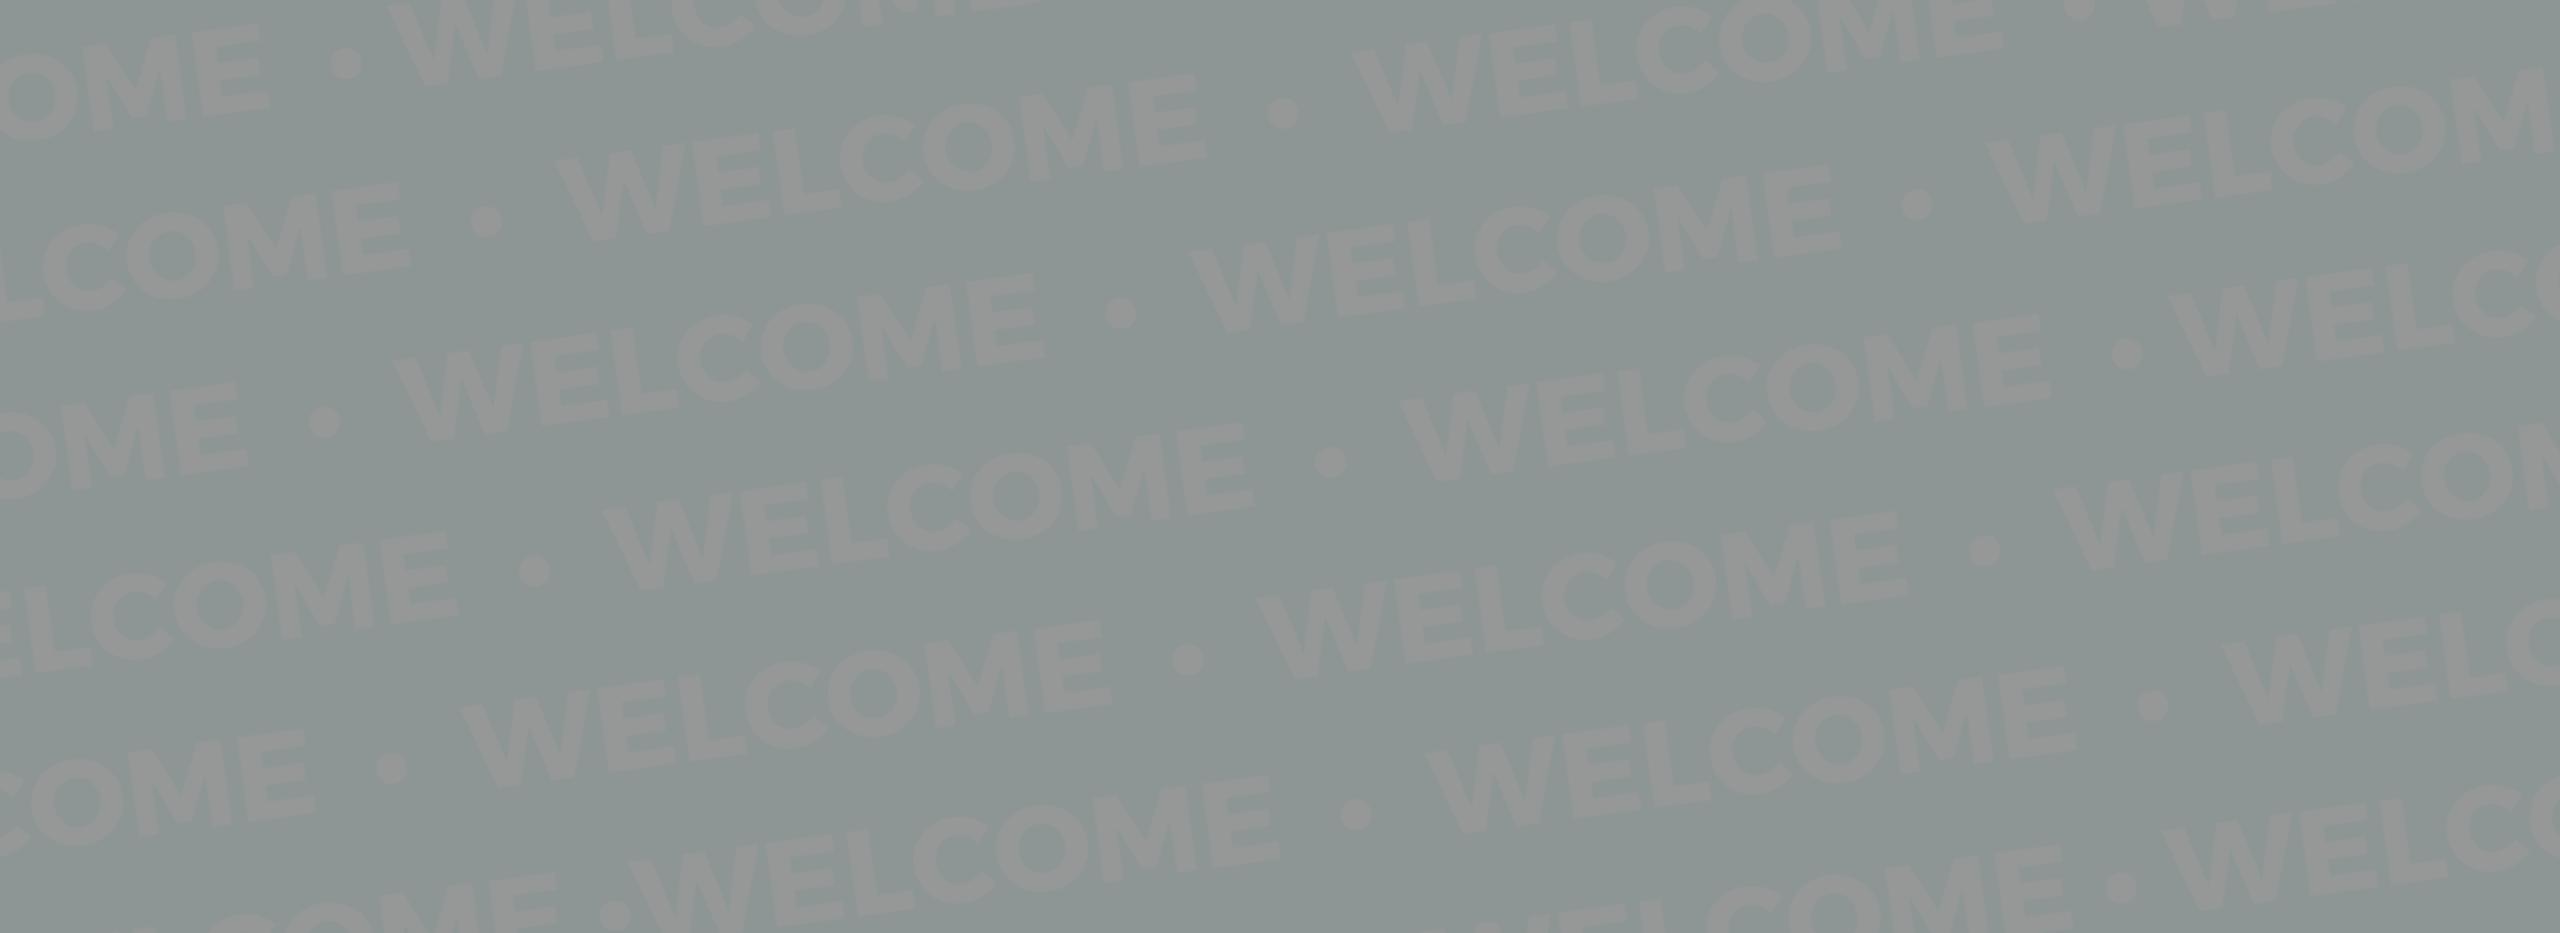 MRE | AP Welcomes New Agent Danielle Preston